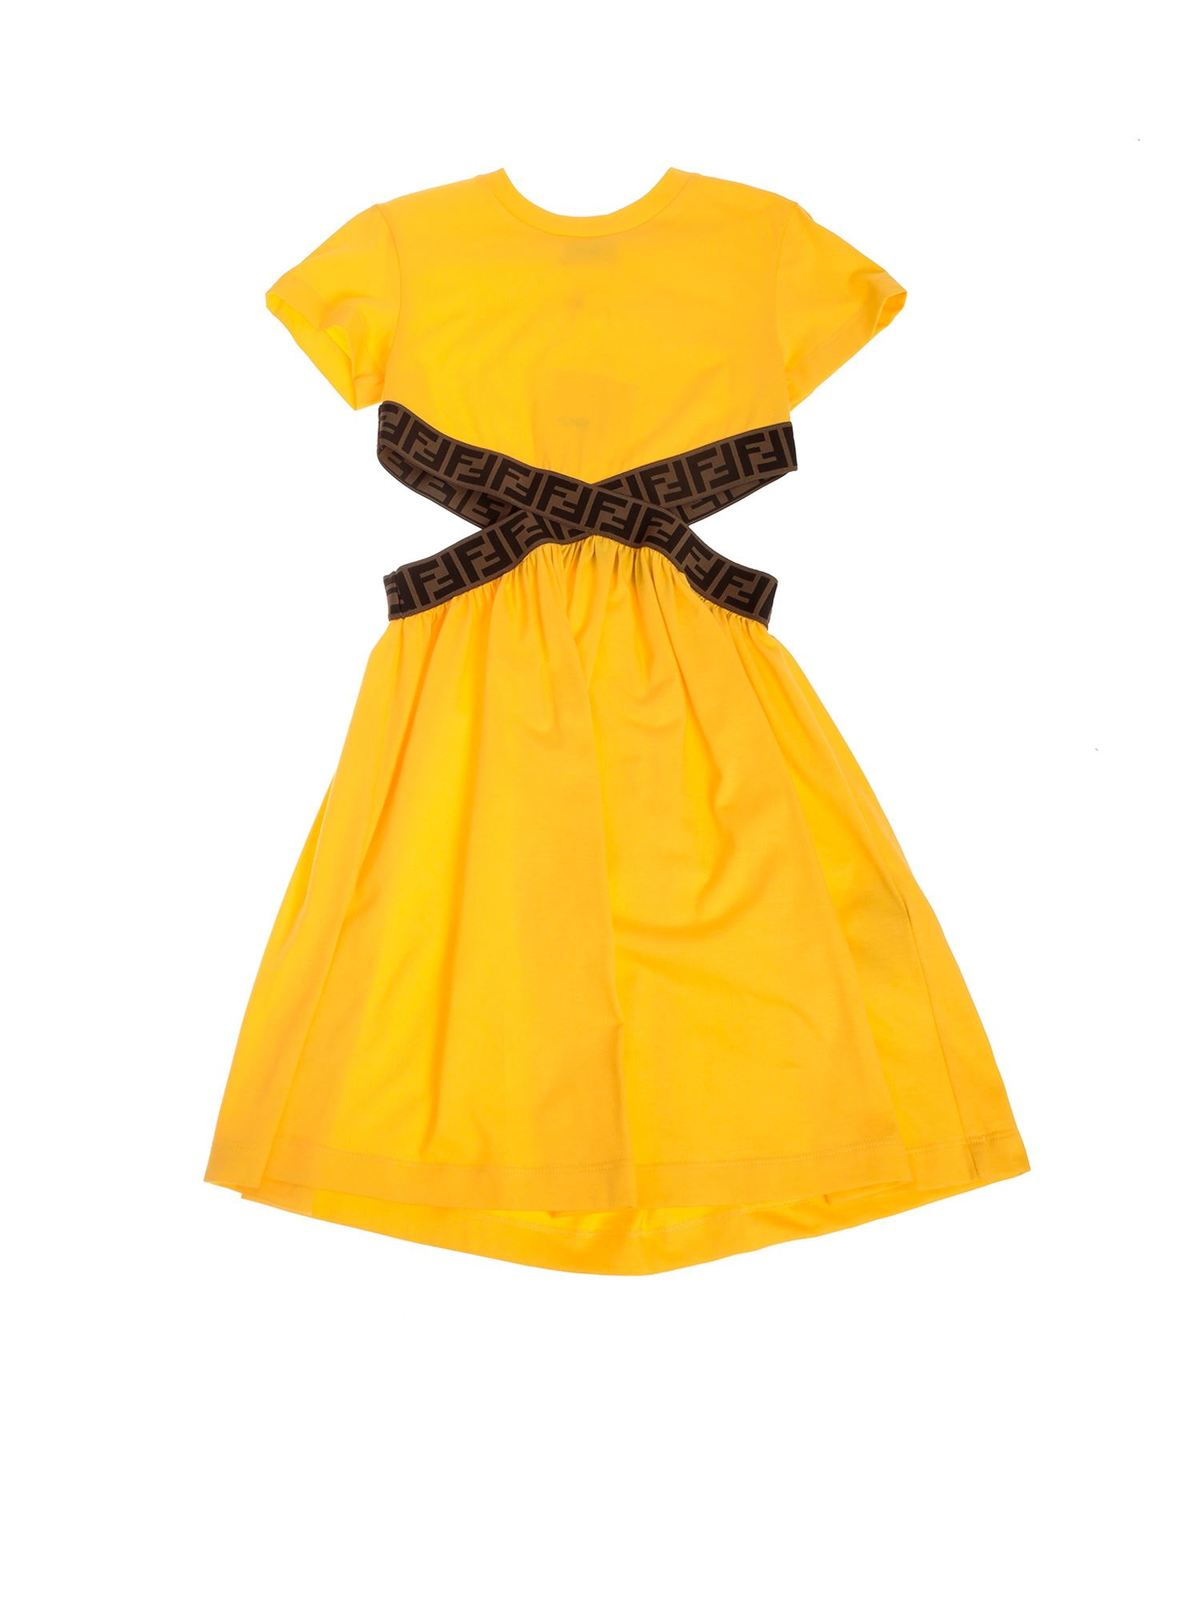 Fendi Jr Dresses ZUCCA PRINT DETAILED DRESS IN YELLOW